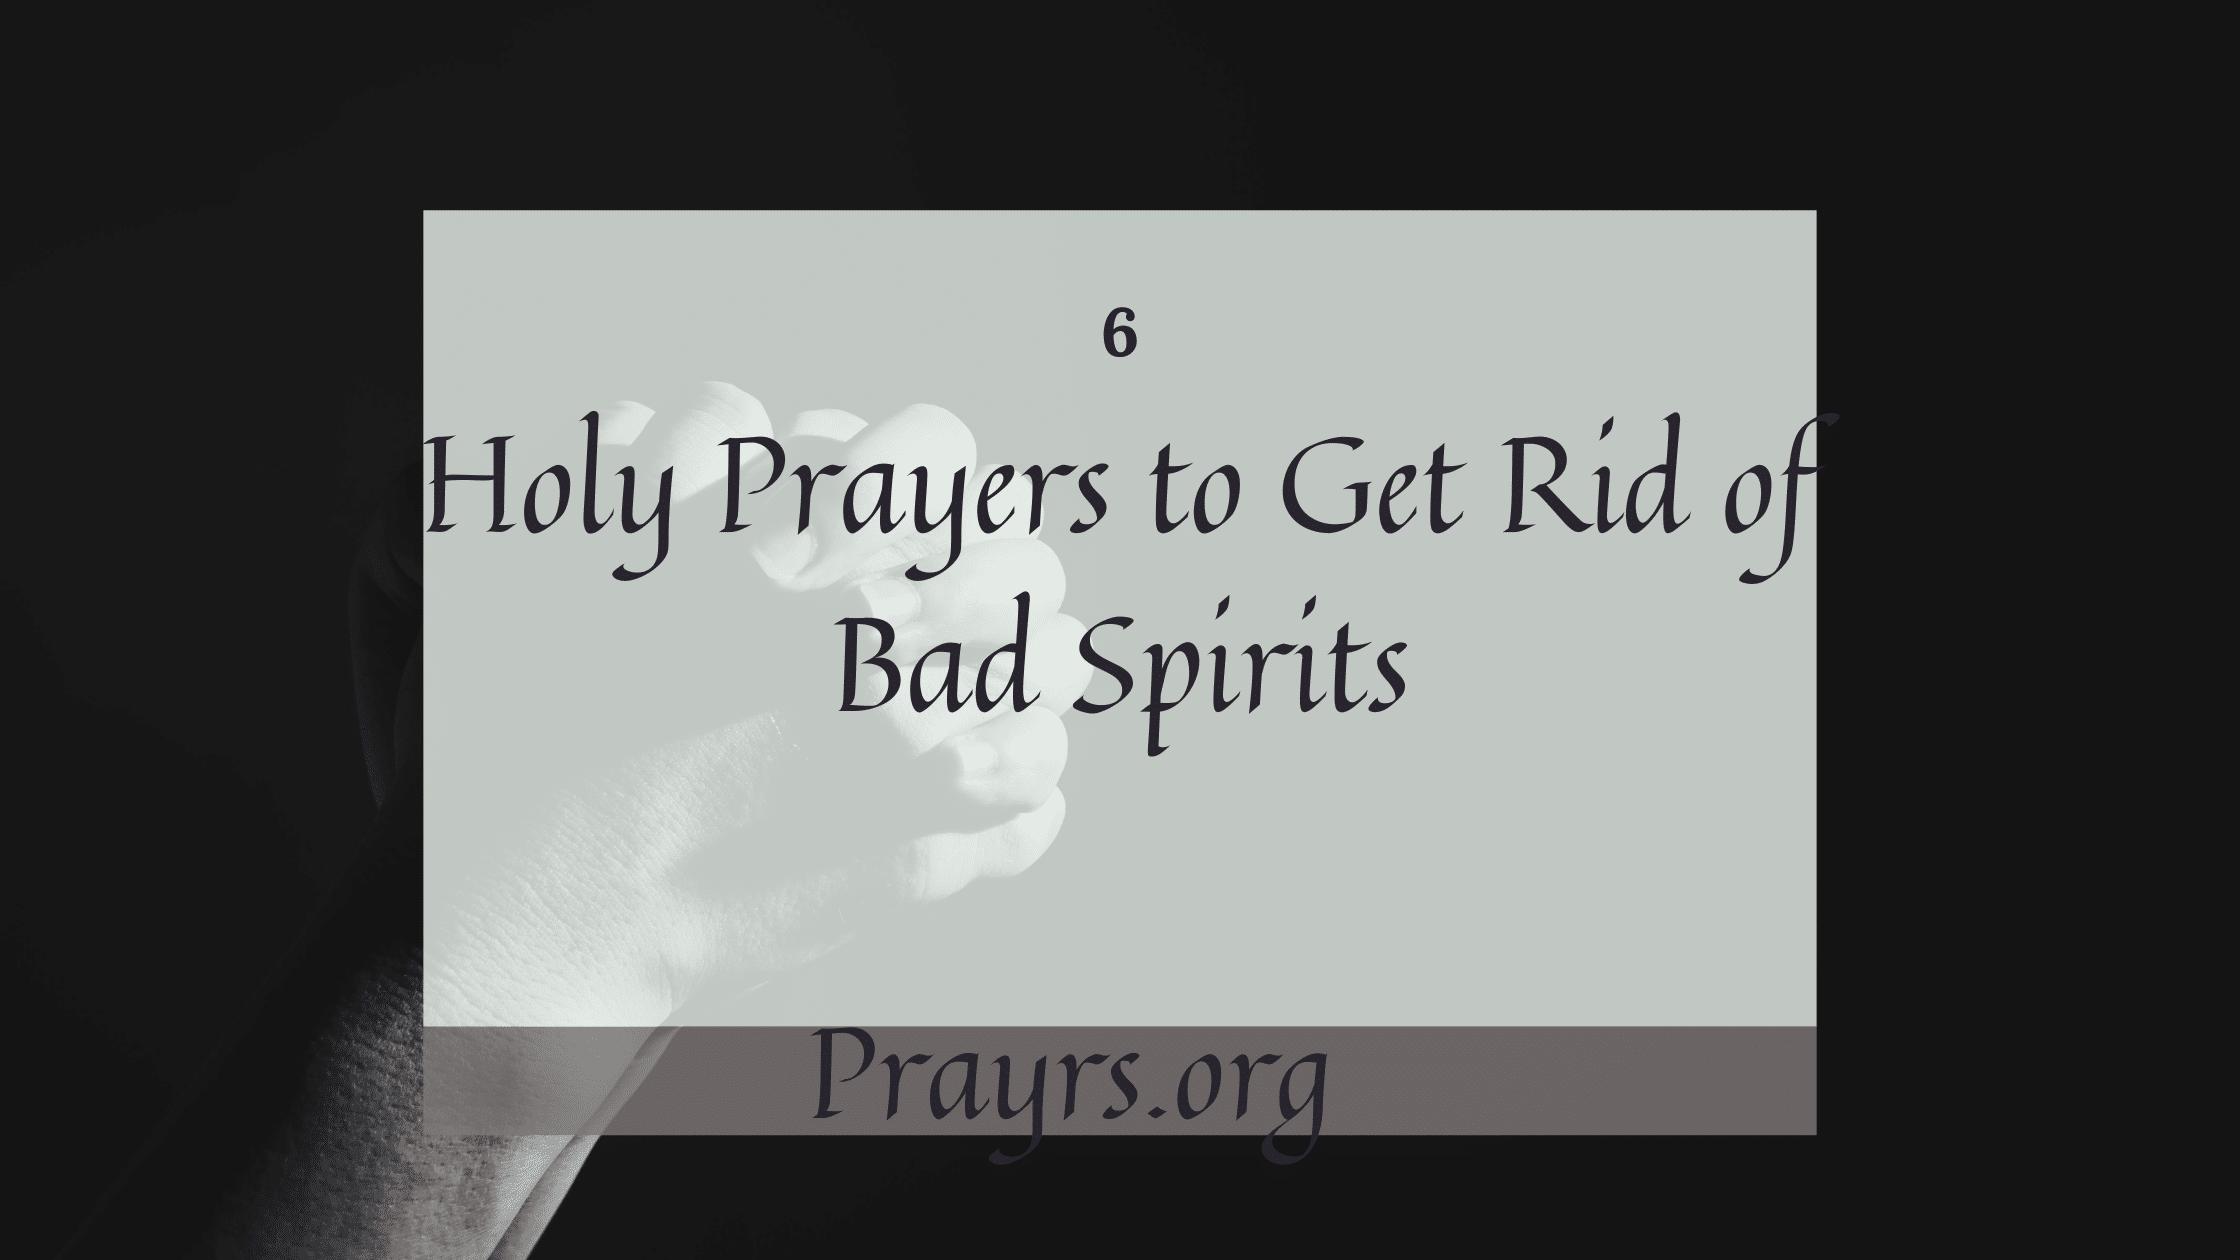 Holy Prayers to Get Rid of Bad Spirits